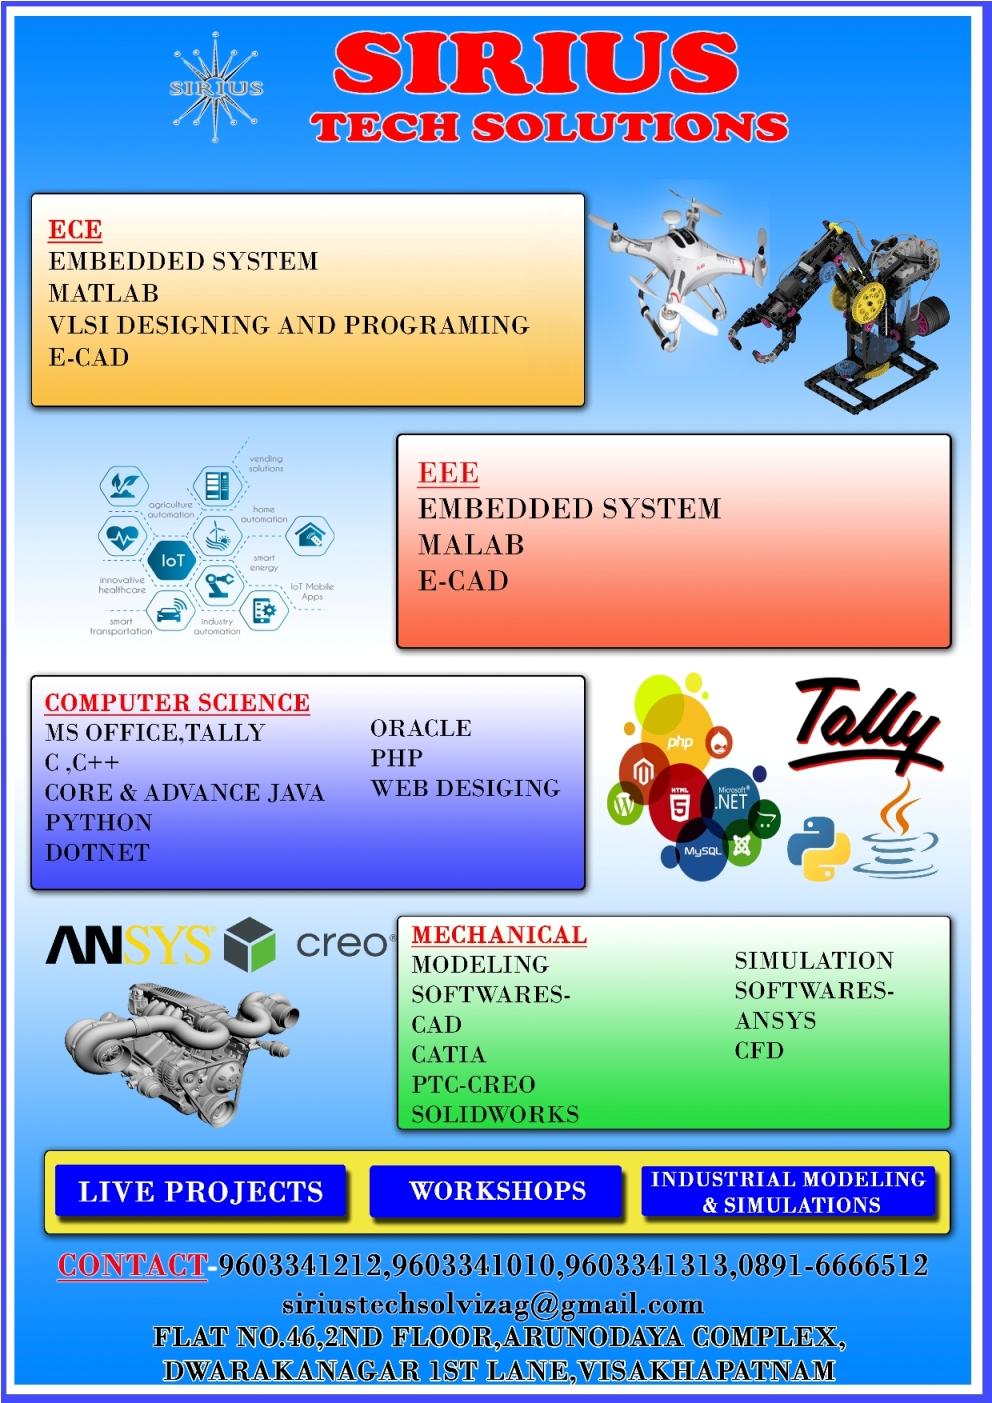 VLSI Design Course in Visakhapatnam, VLSI Design Training in